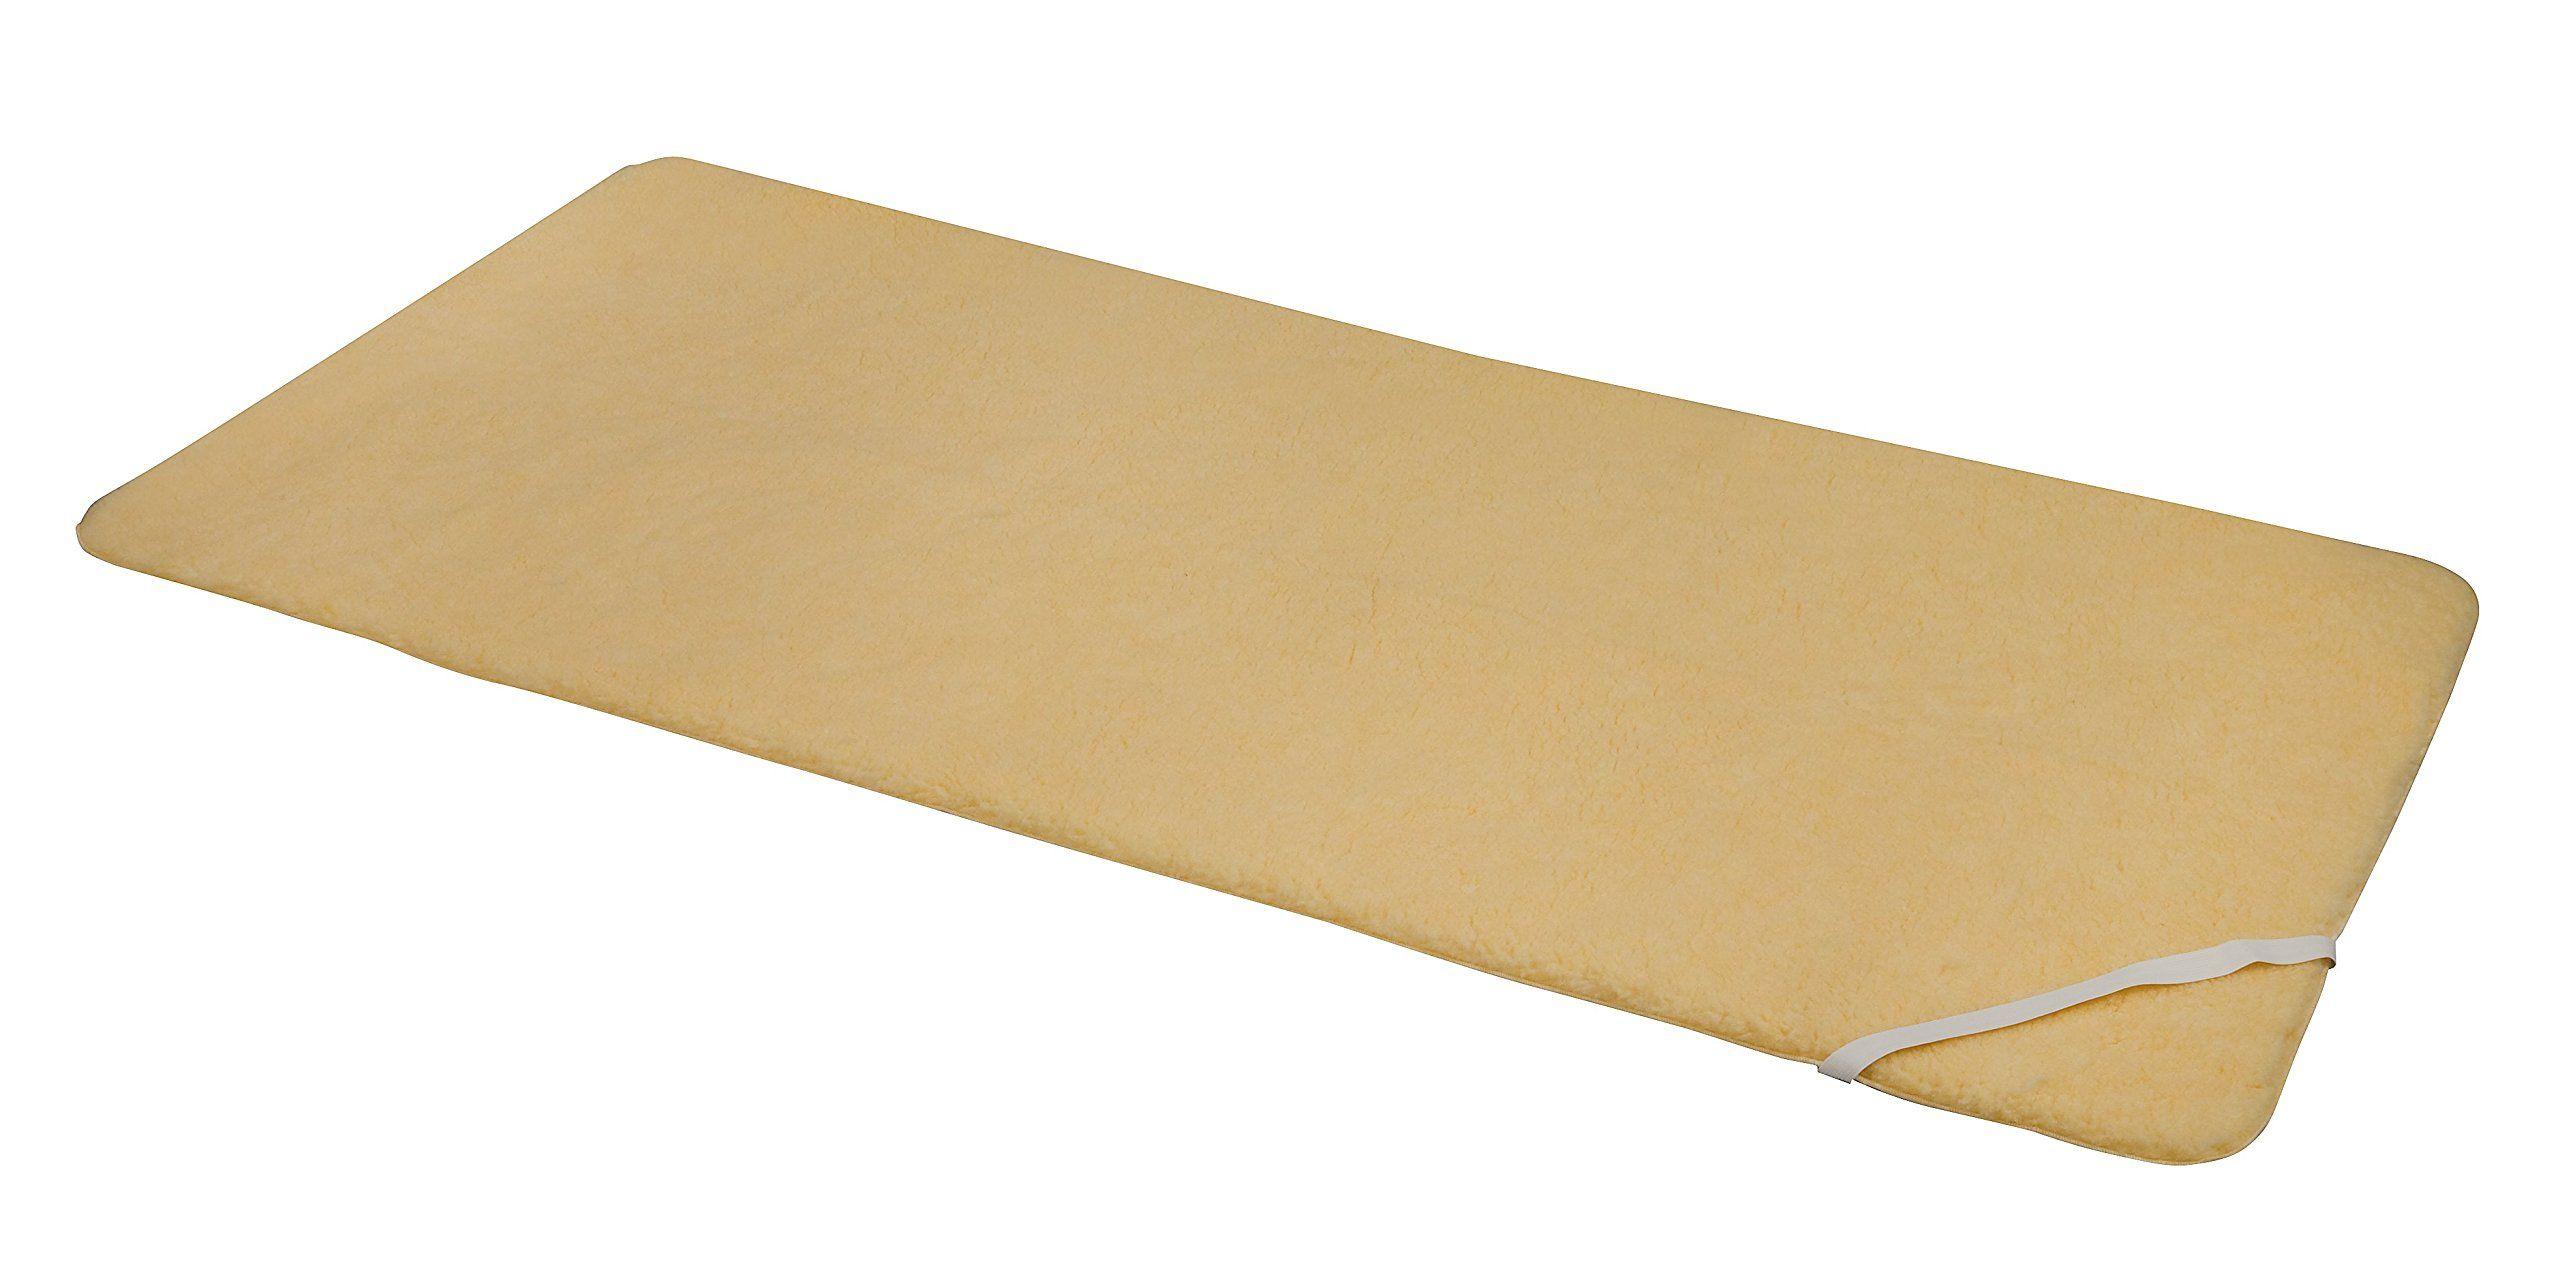 Dmi Synthetic Sheepskin Mattress Pad Hypoallergenic Sheepskin Mattress Topper Washable Sheepskin Bed Pad With Elastic Str Bed Pads Mattress Pad Mattress Topper